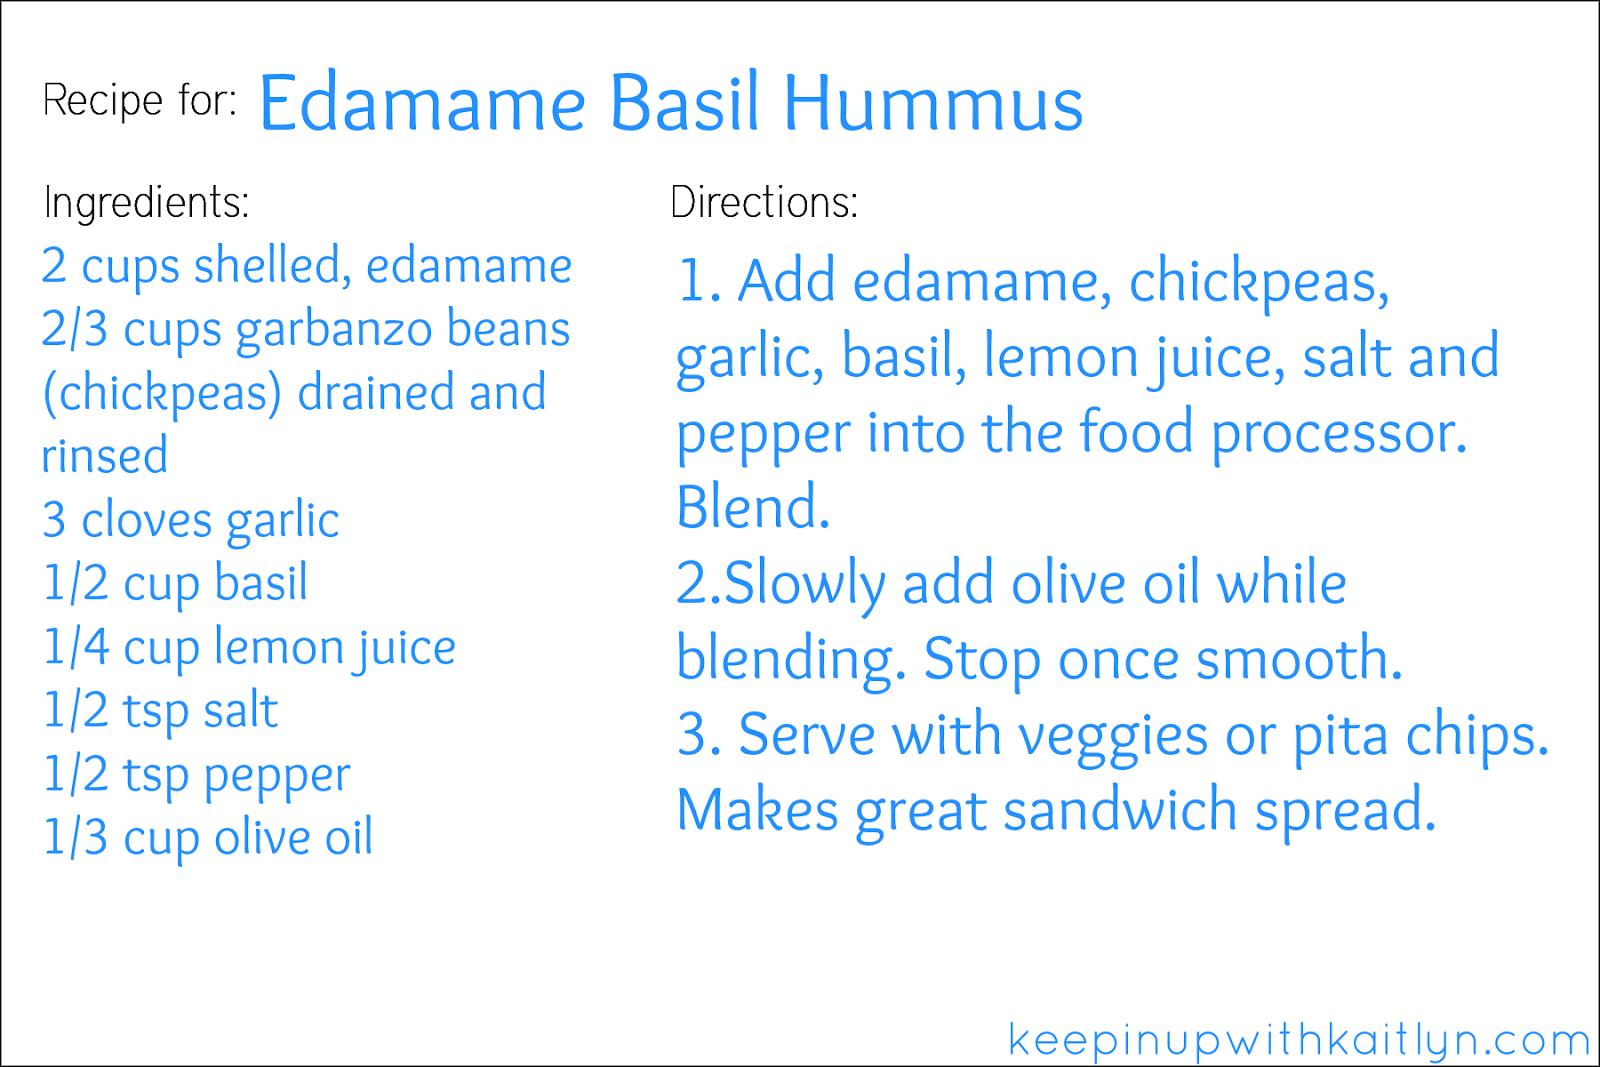 Edamame Basil Hummus recipe